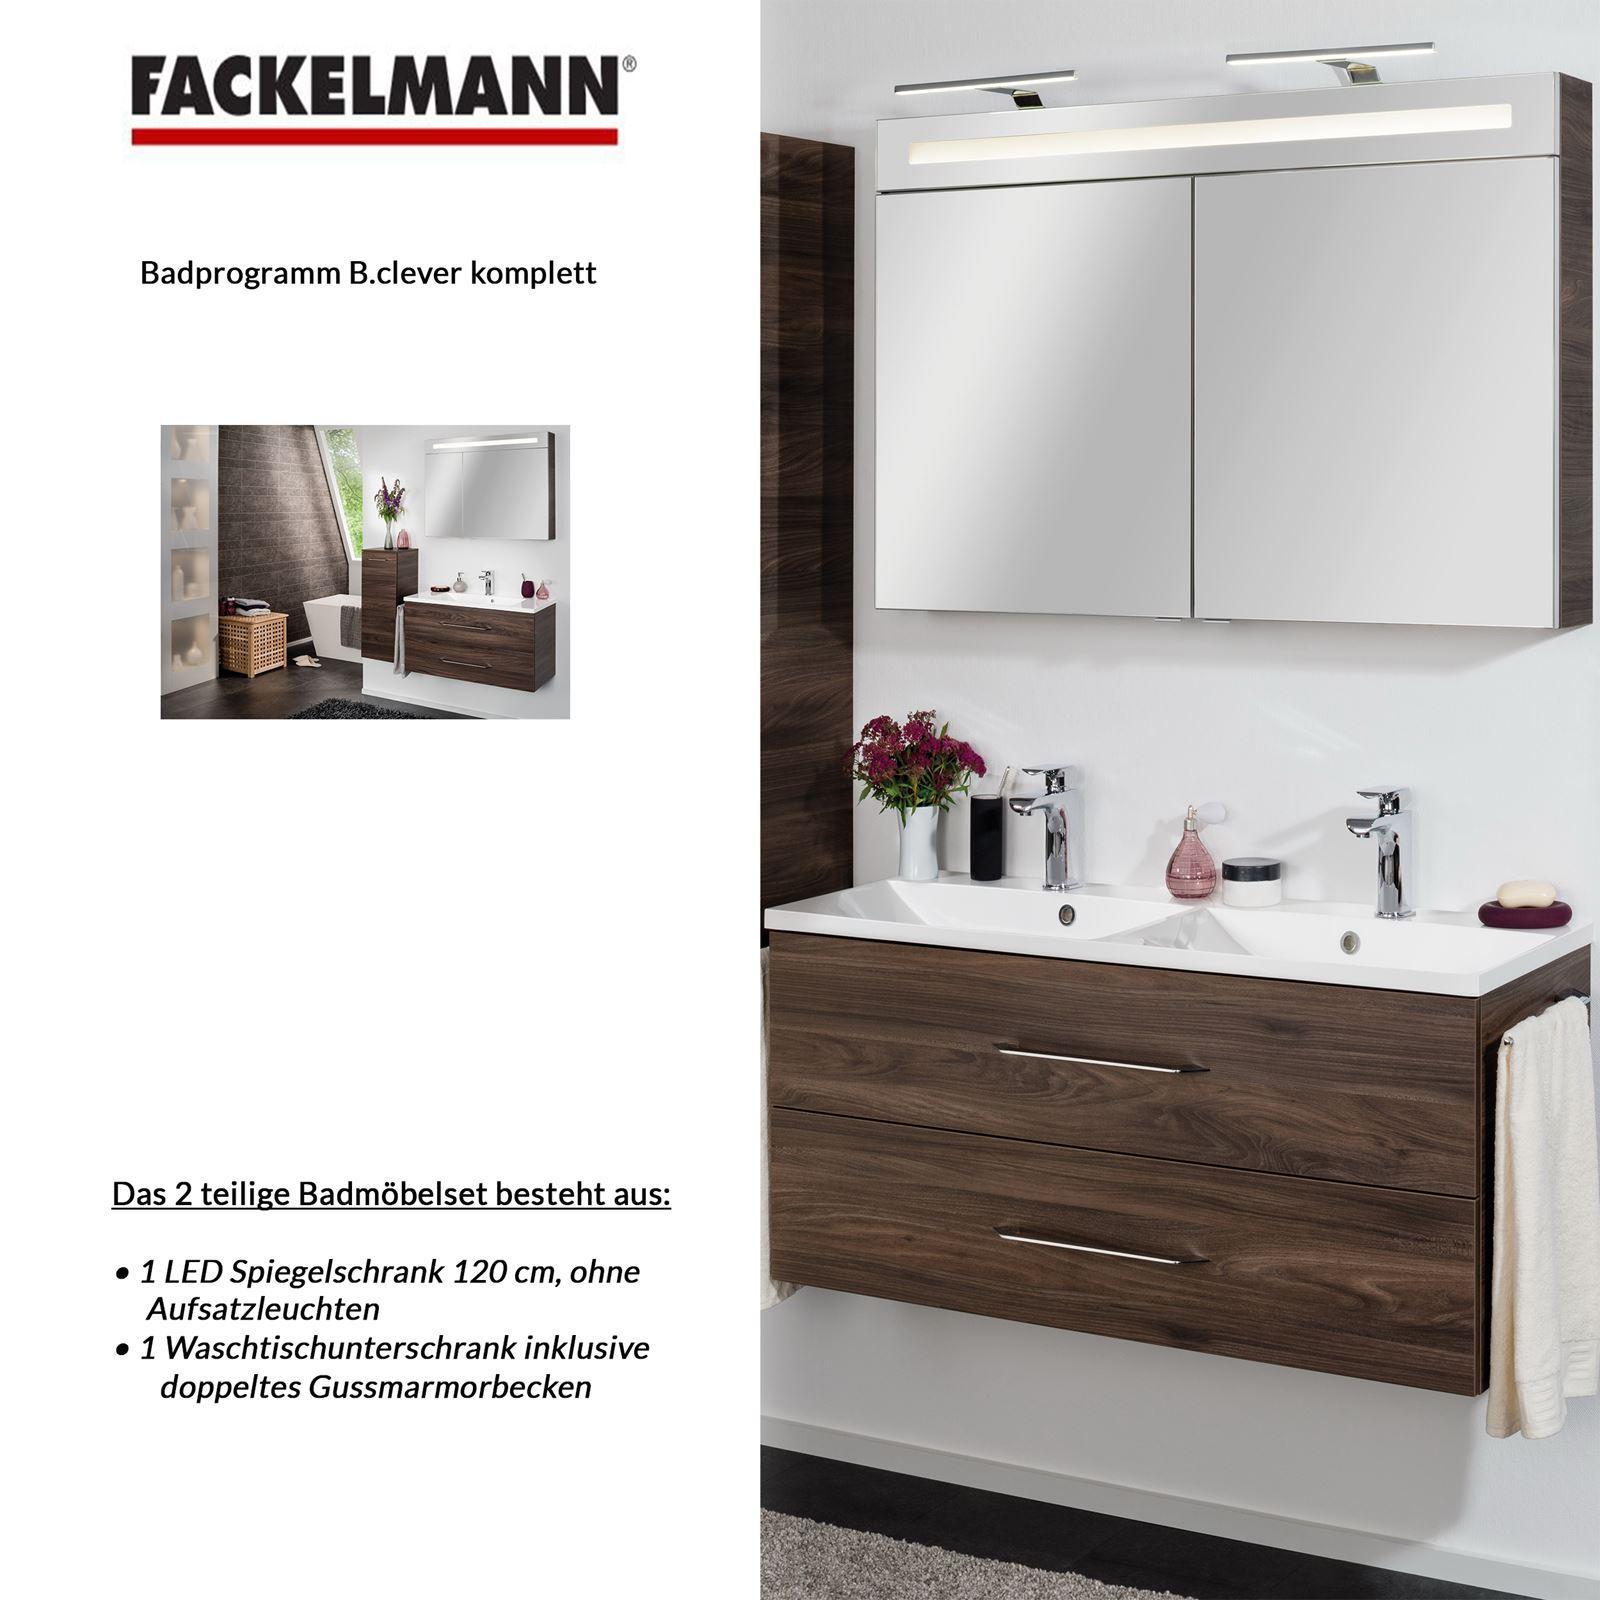 Badmöbel Set Fackelmann